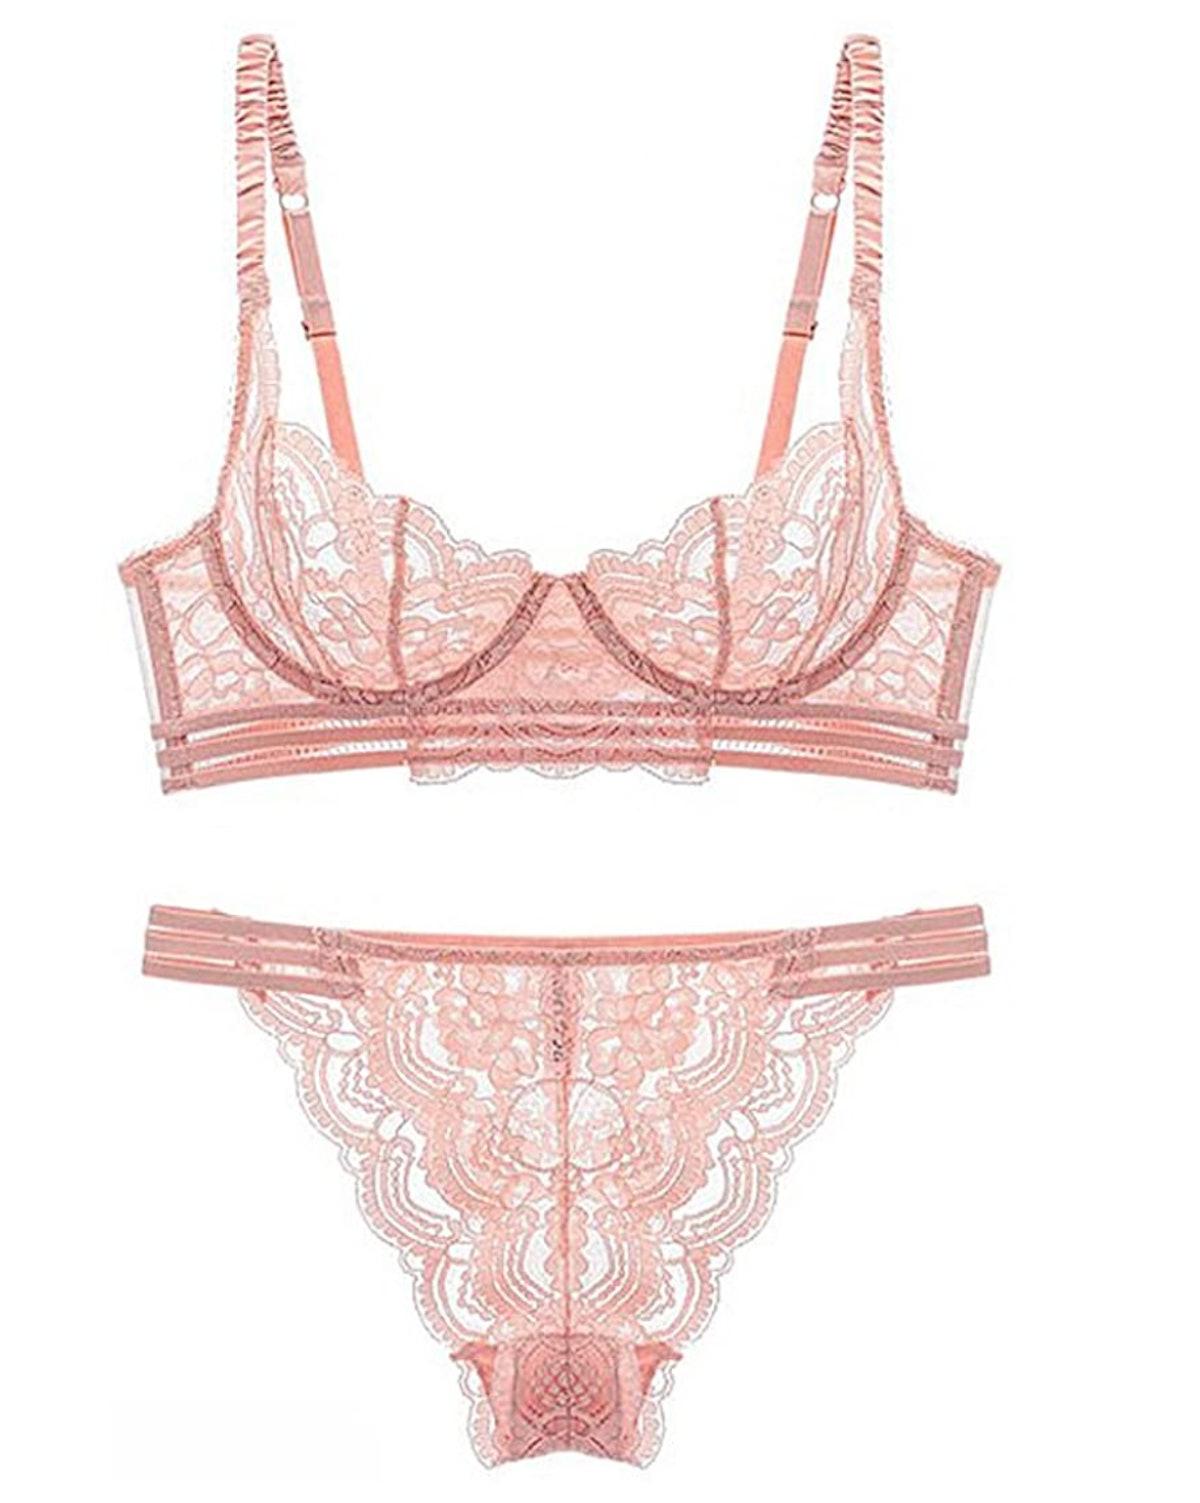 Guoeappa Women's Sexy Soft Lace Lingerie Set